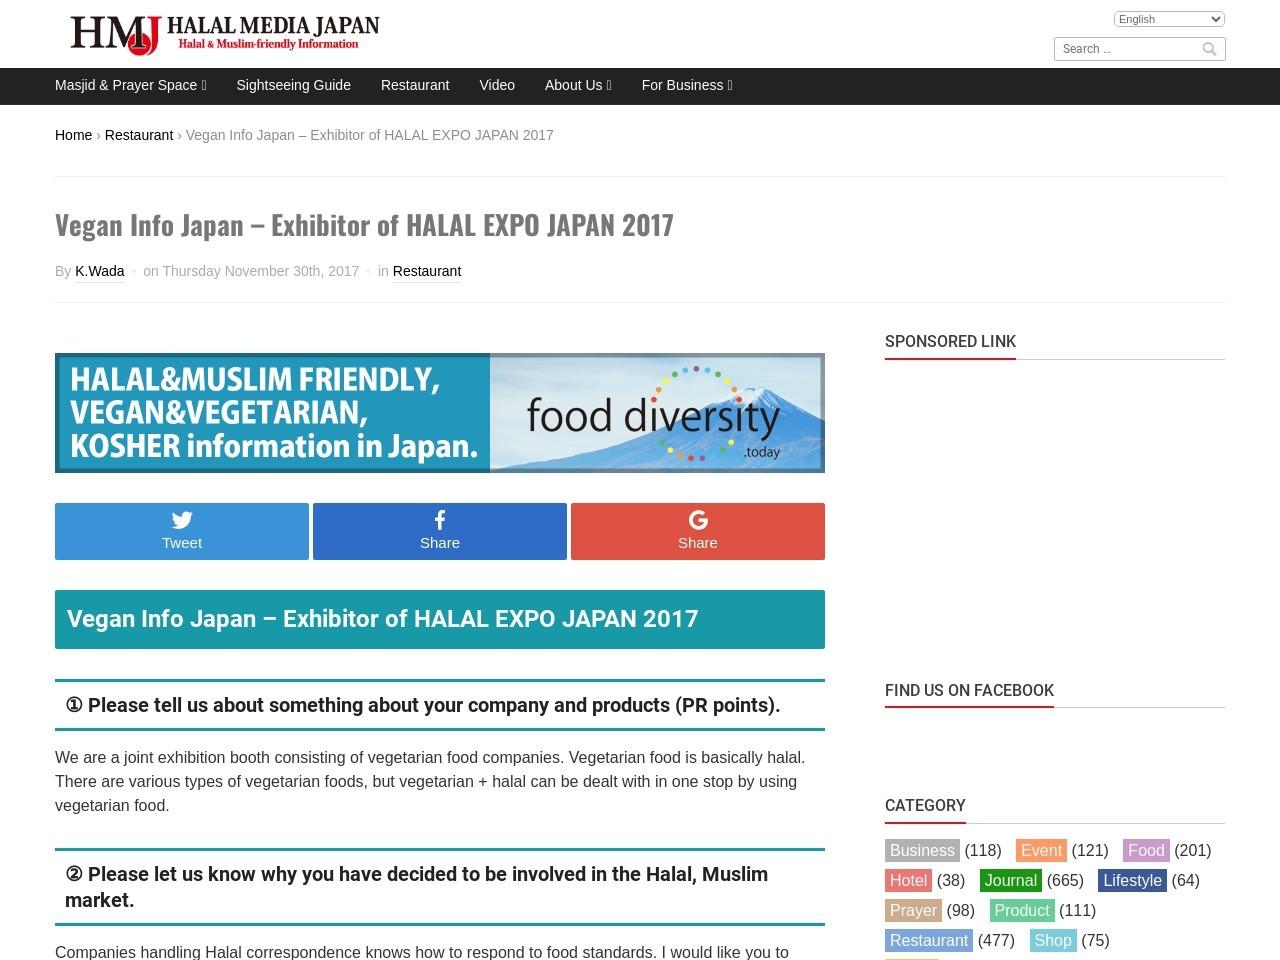 Vegan Info Japan – Exhibitor of HALAL EXPO JAPAN 2017